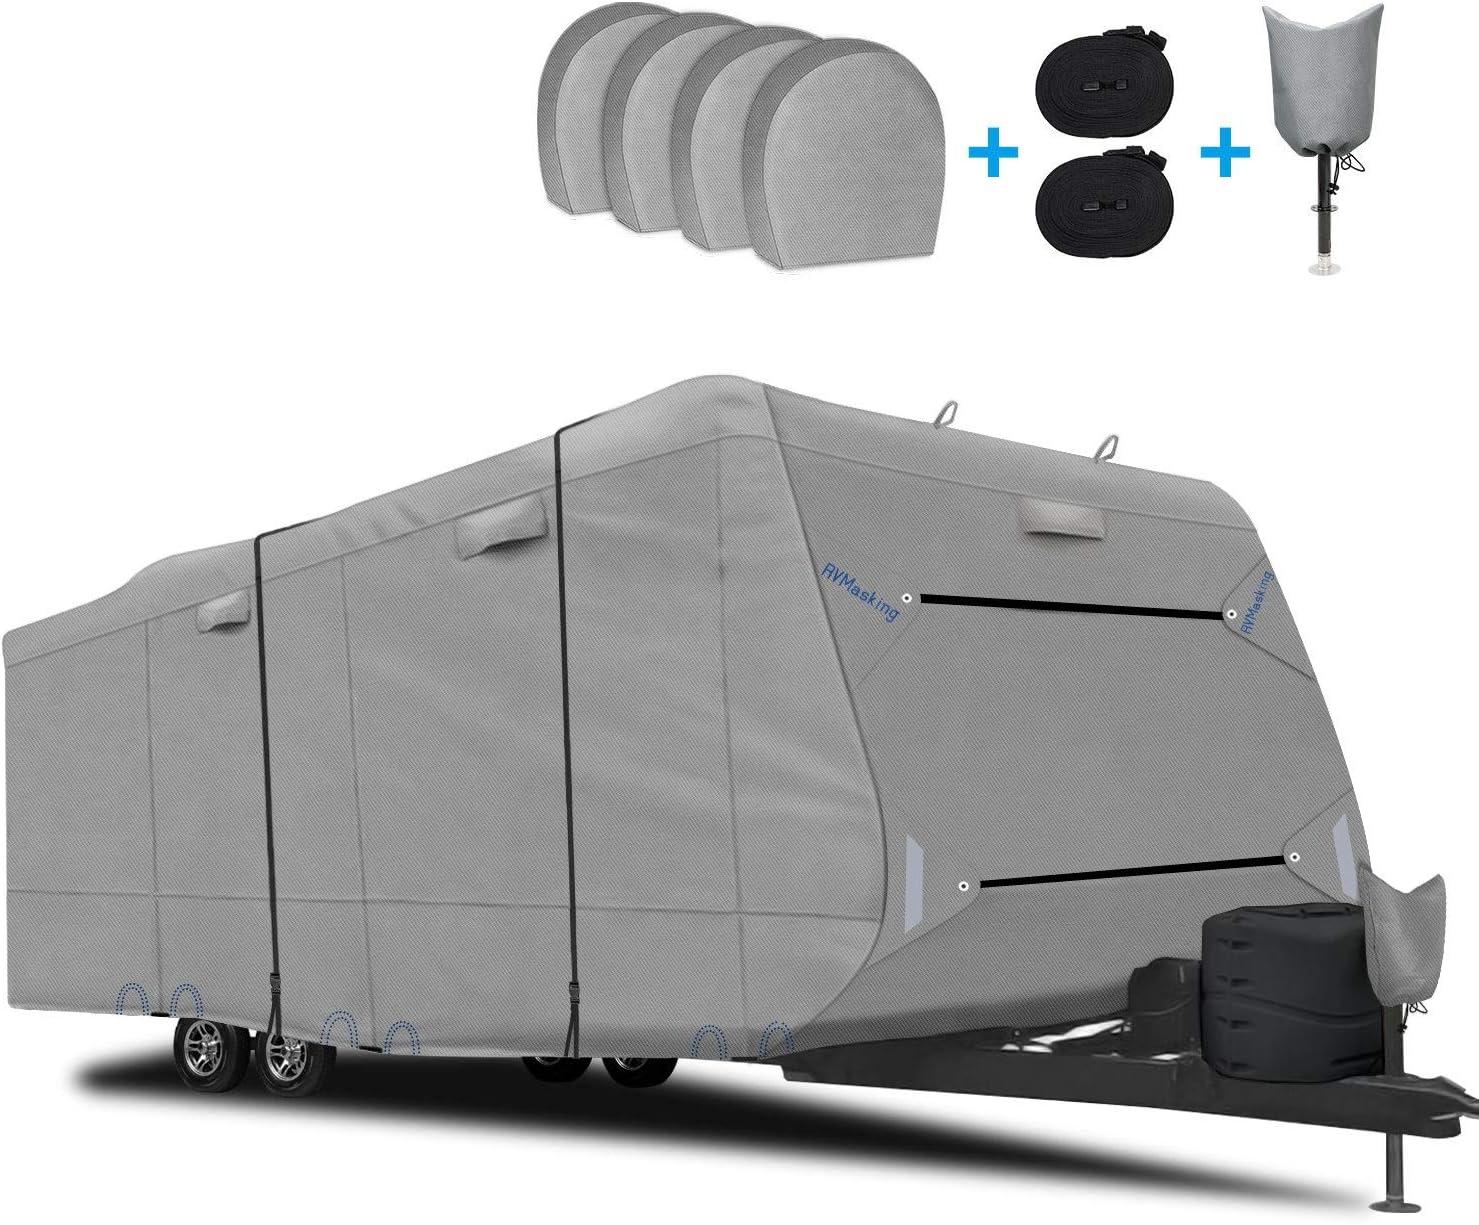 RVMasking Upgraded Waterproof & Windproof Travel Trailer RV Cover Camper